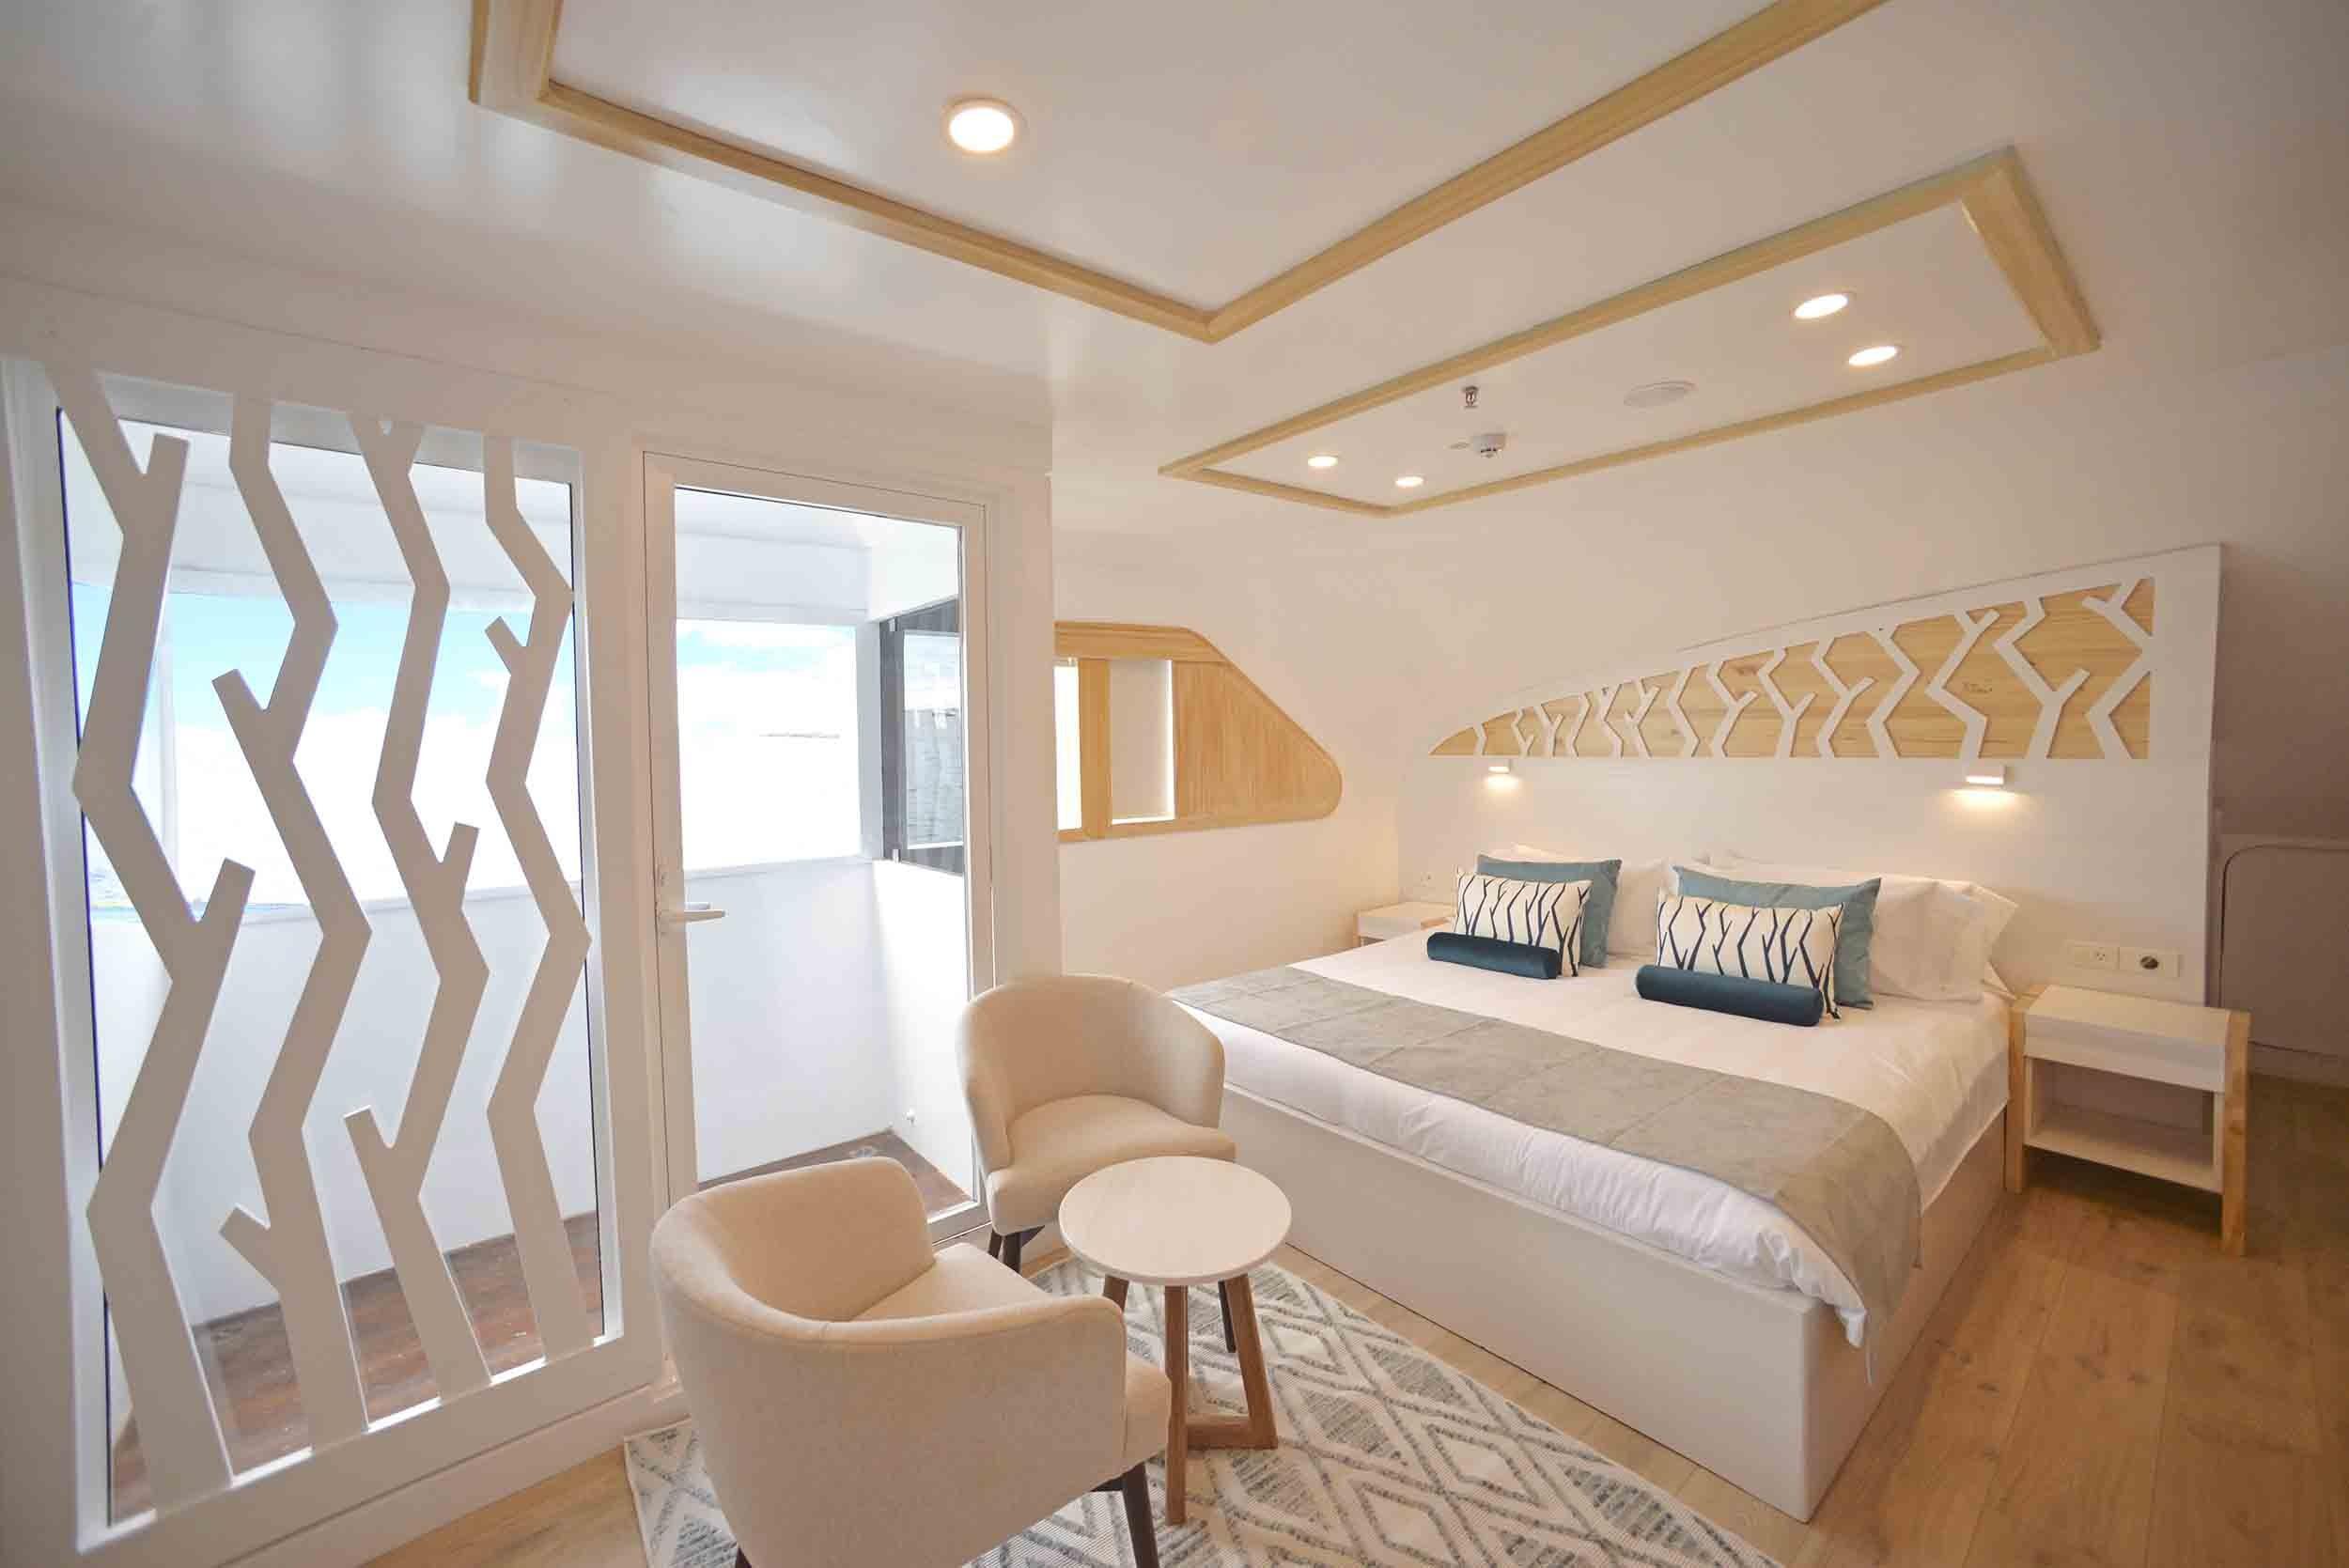 Sea Star Journey |  Matrimonial Suite